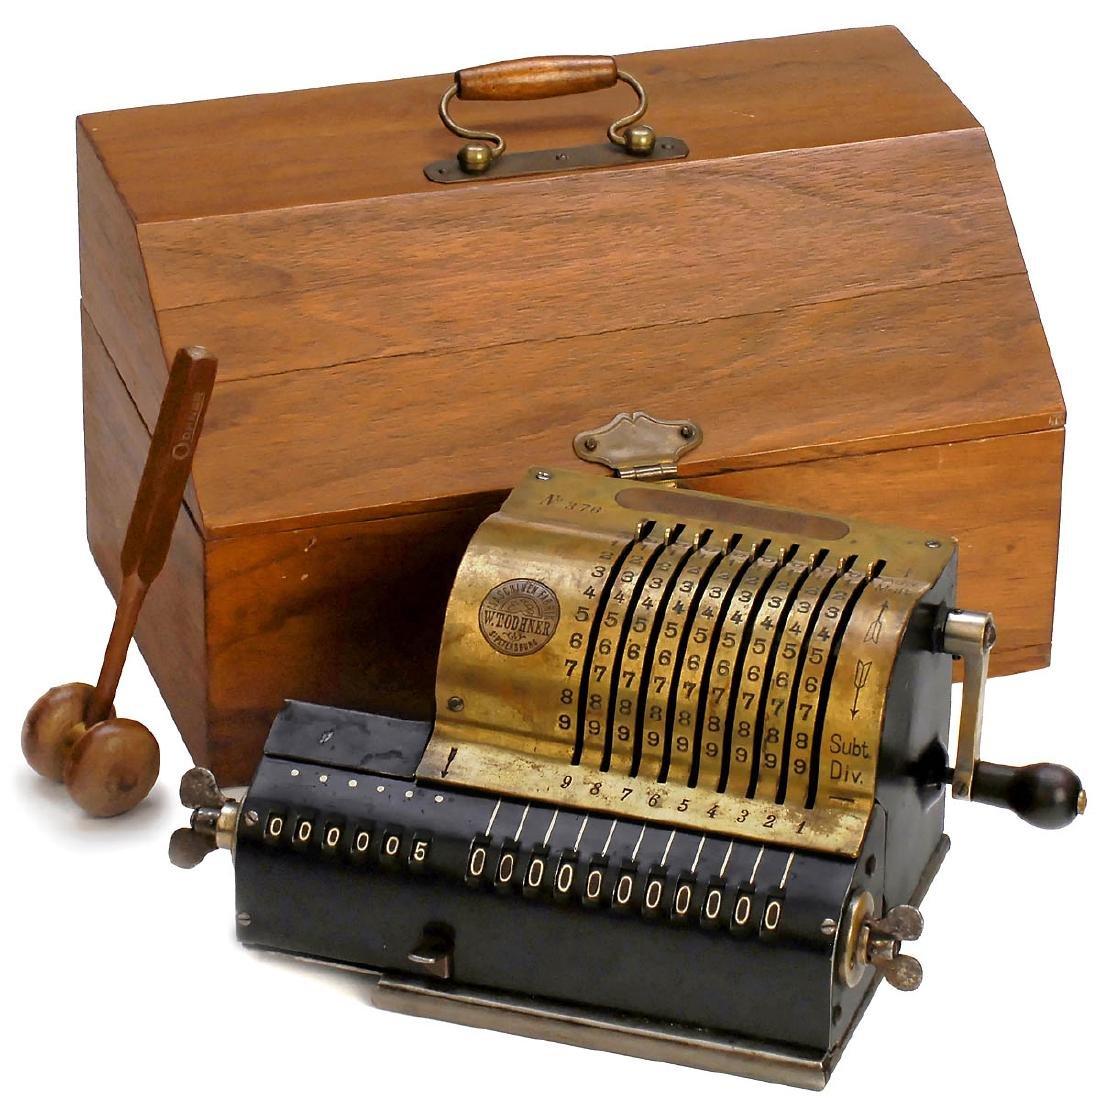 Russian Original Odhner Mod. 1 (Arithmometer), 1886 (!)